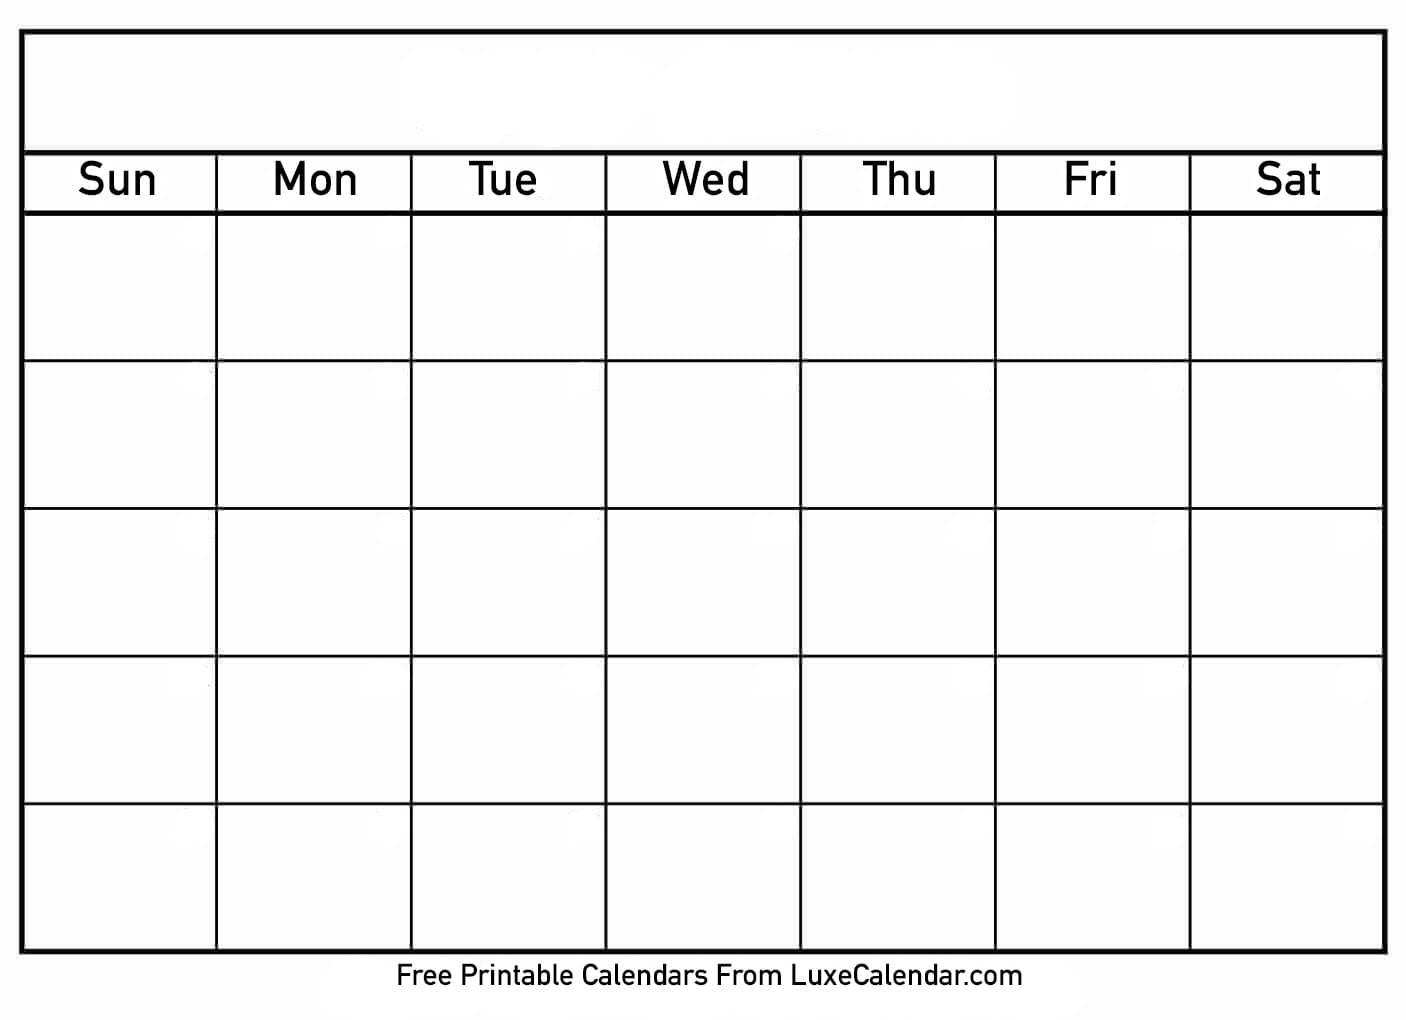 Blank Printable Calendar - Luxe Calendar intended for Blank Calendar Of Events Template